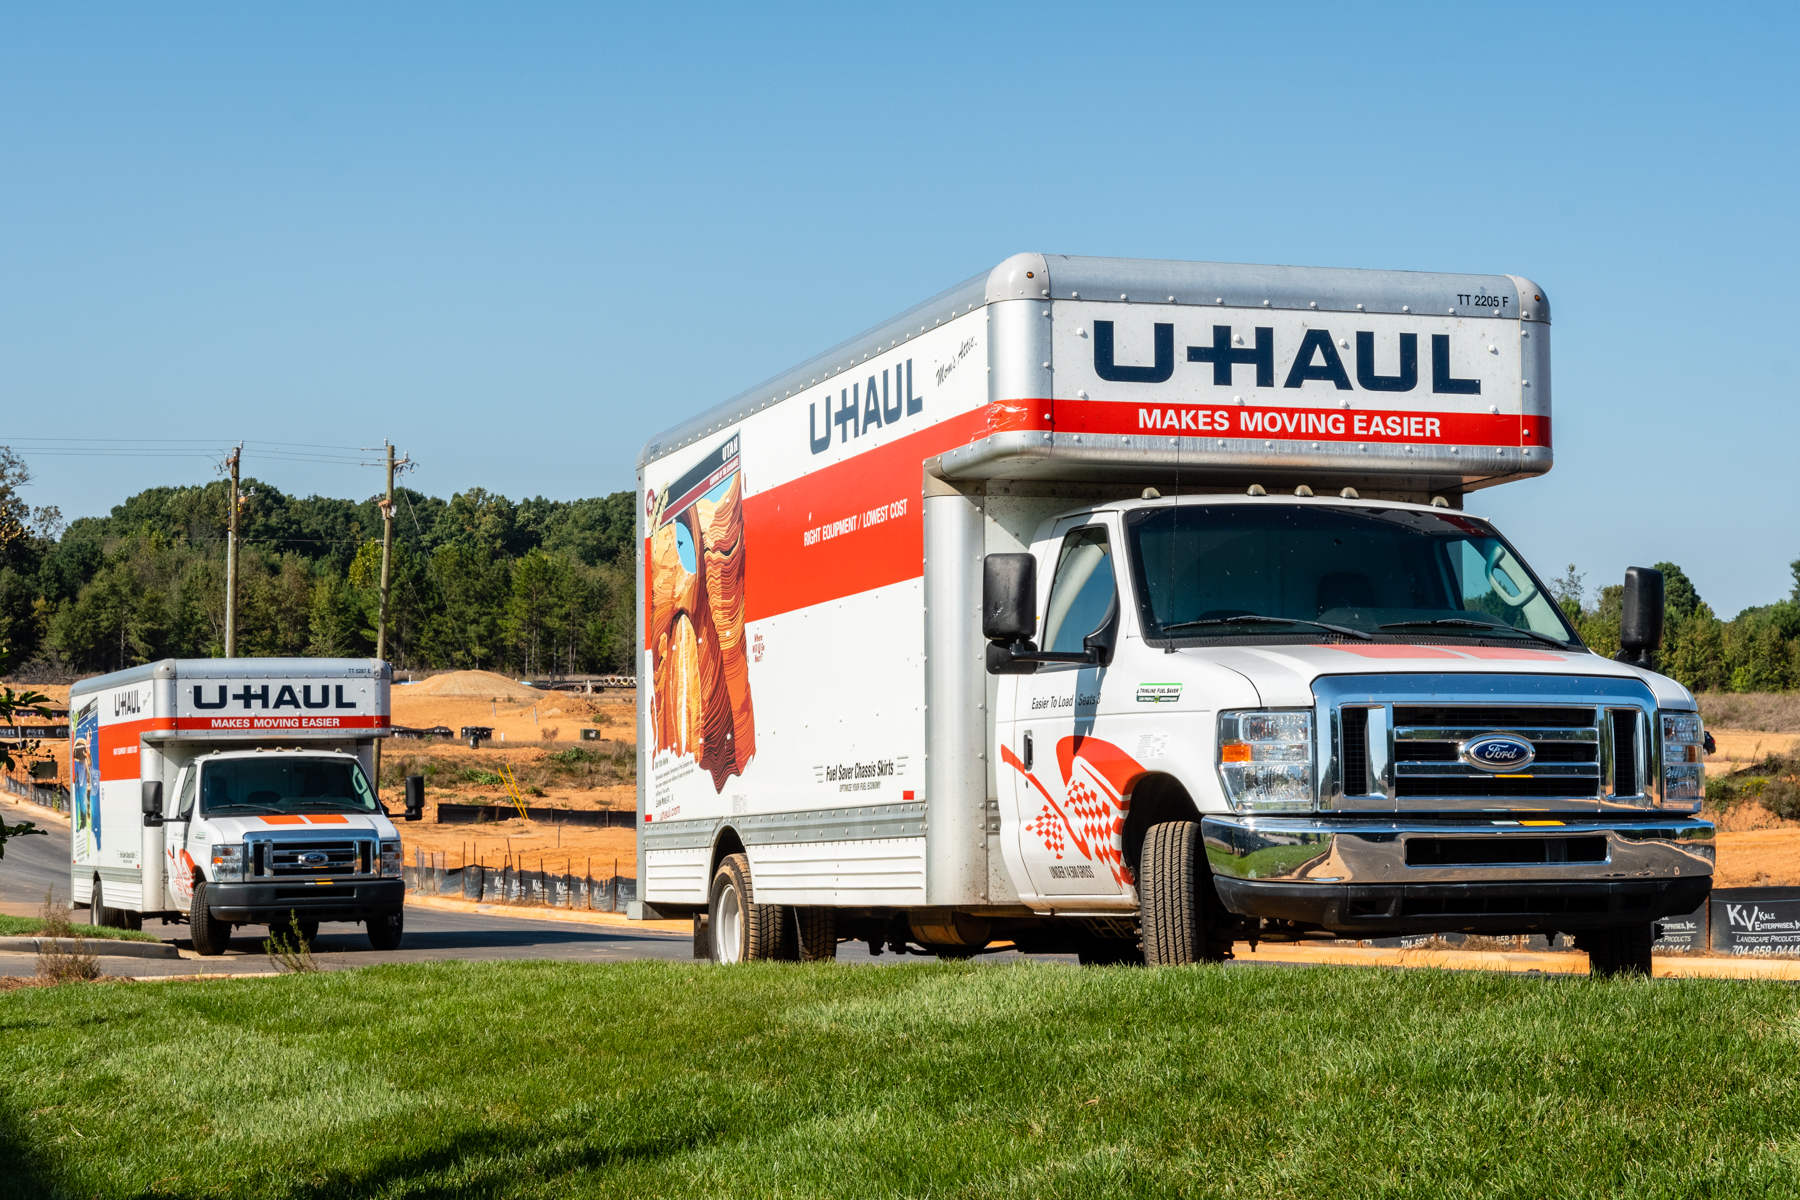 UHAUL Truck and Trailer Rentals